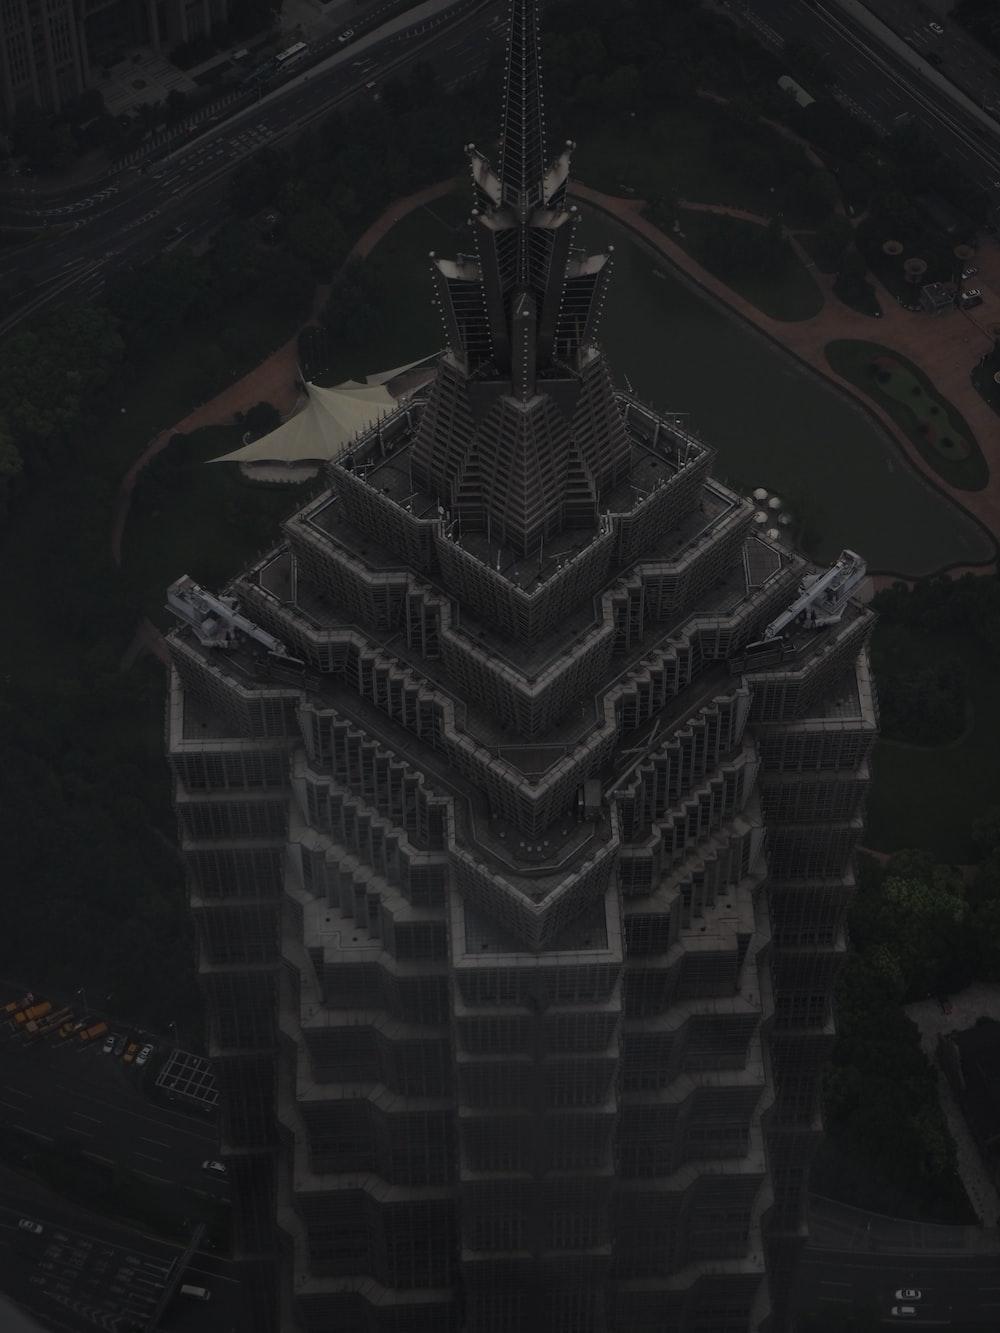 gray and black concrete building